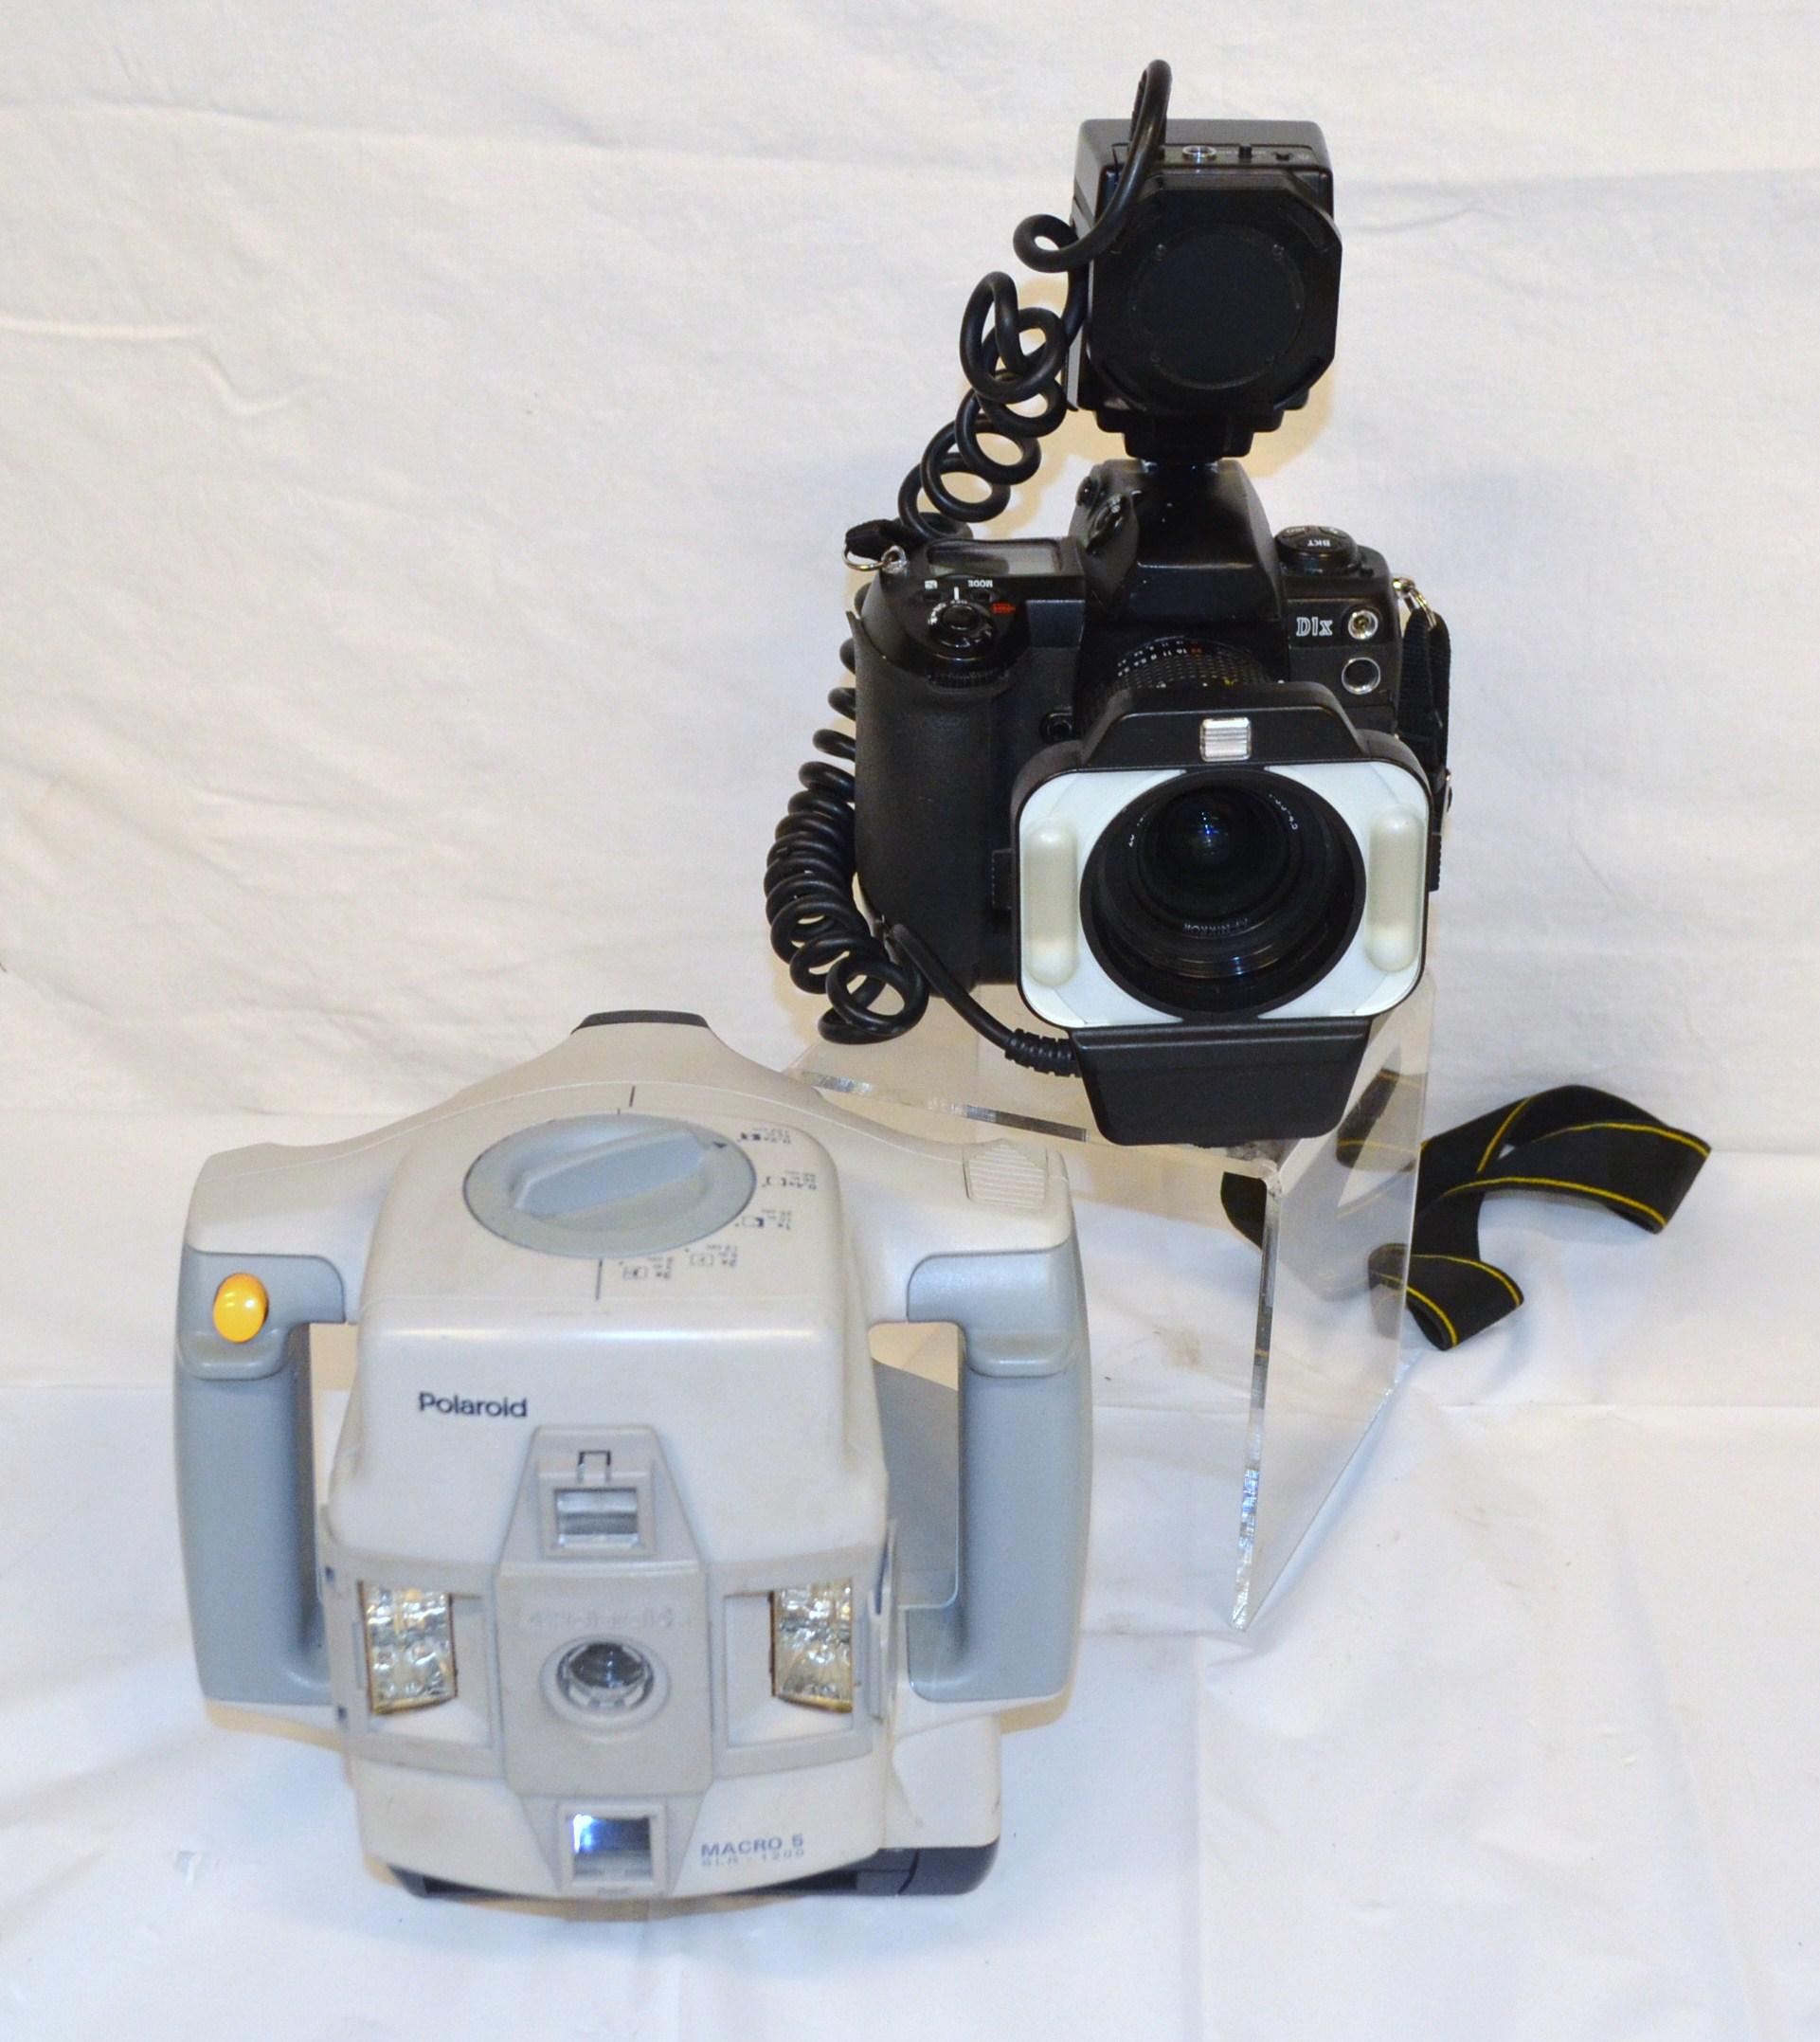 Forensic cameras